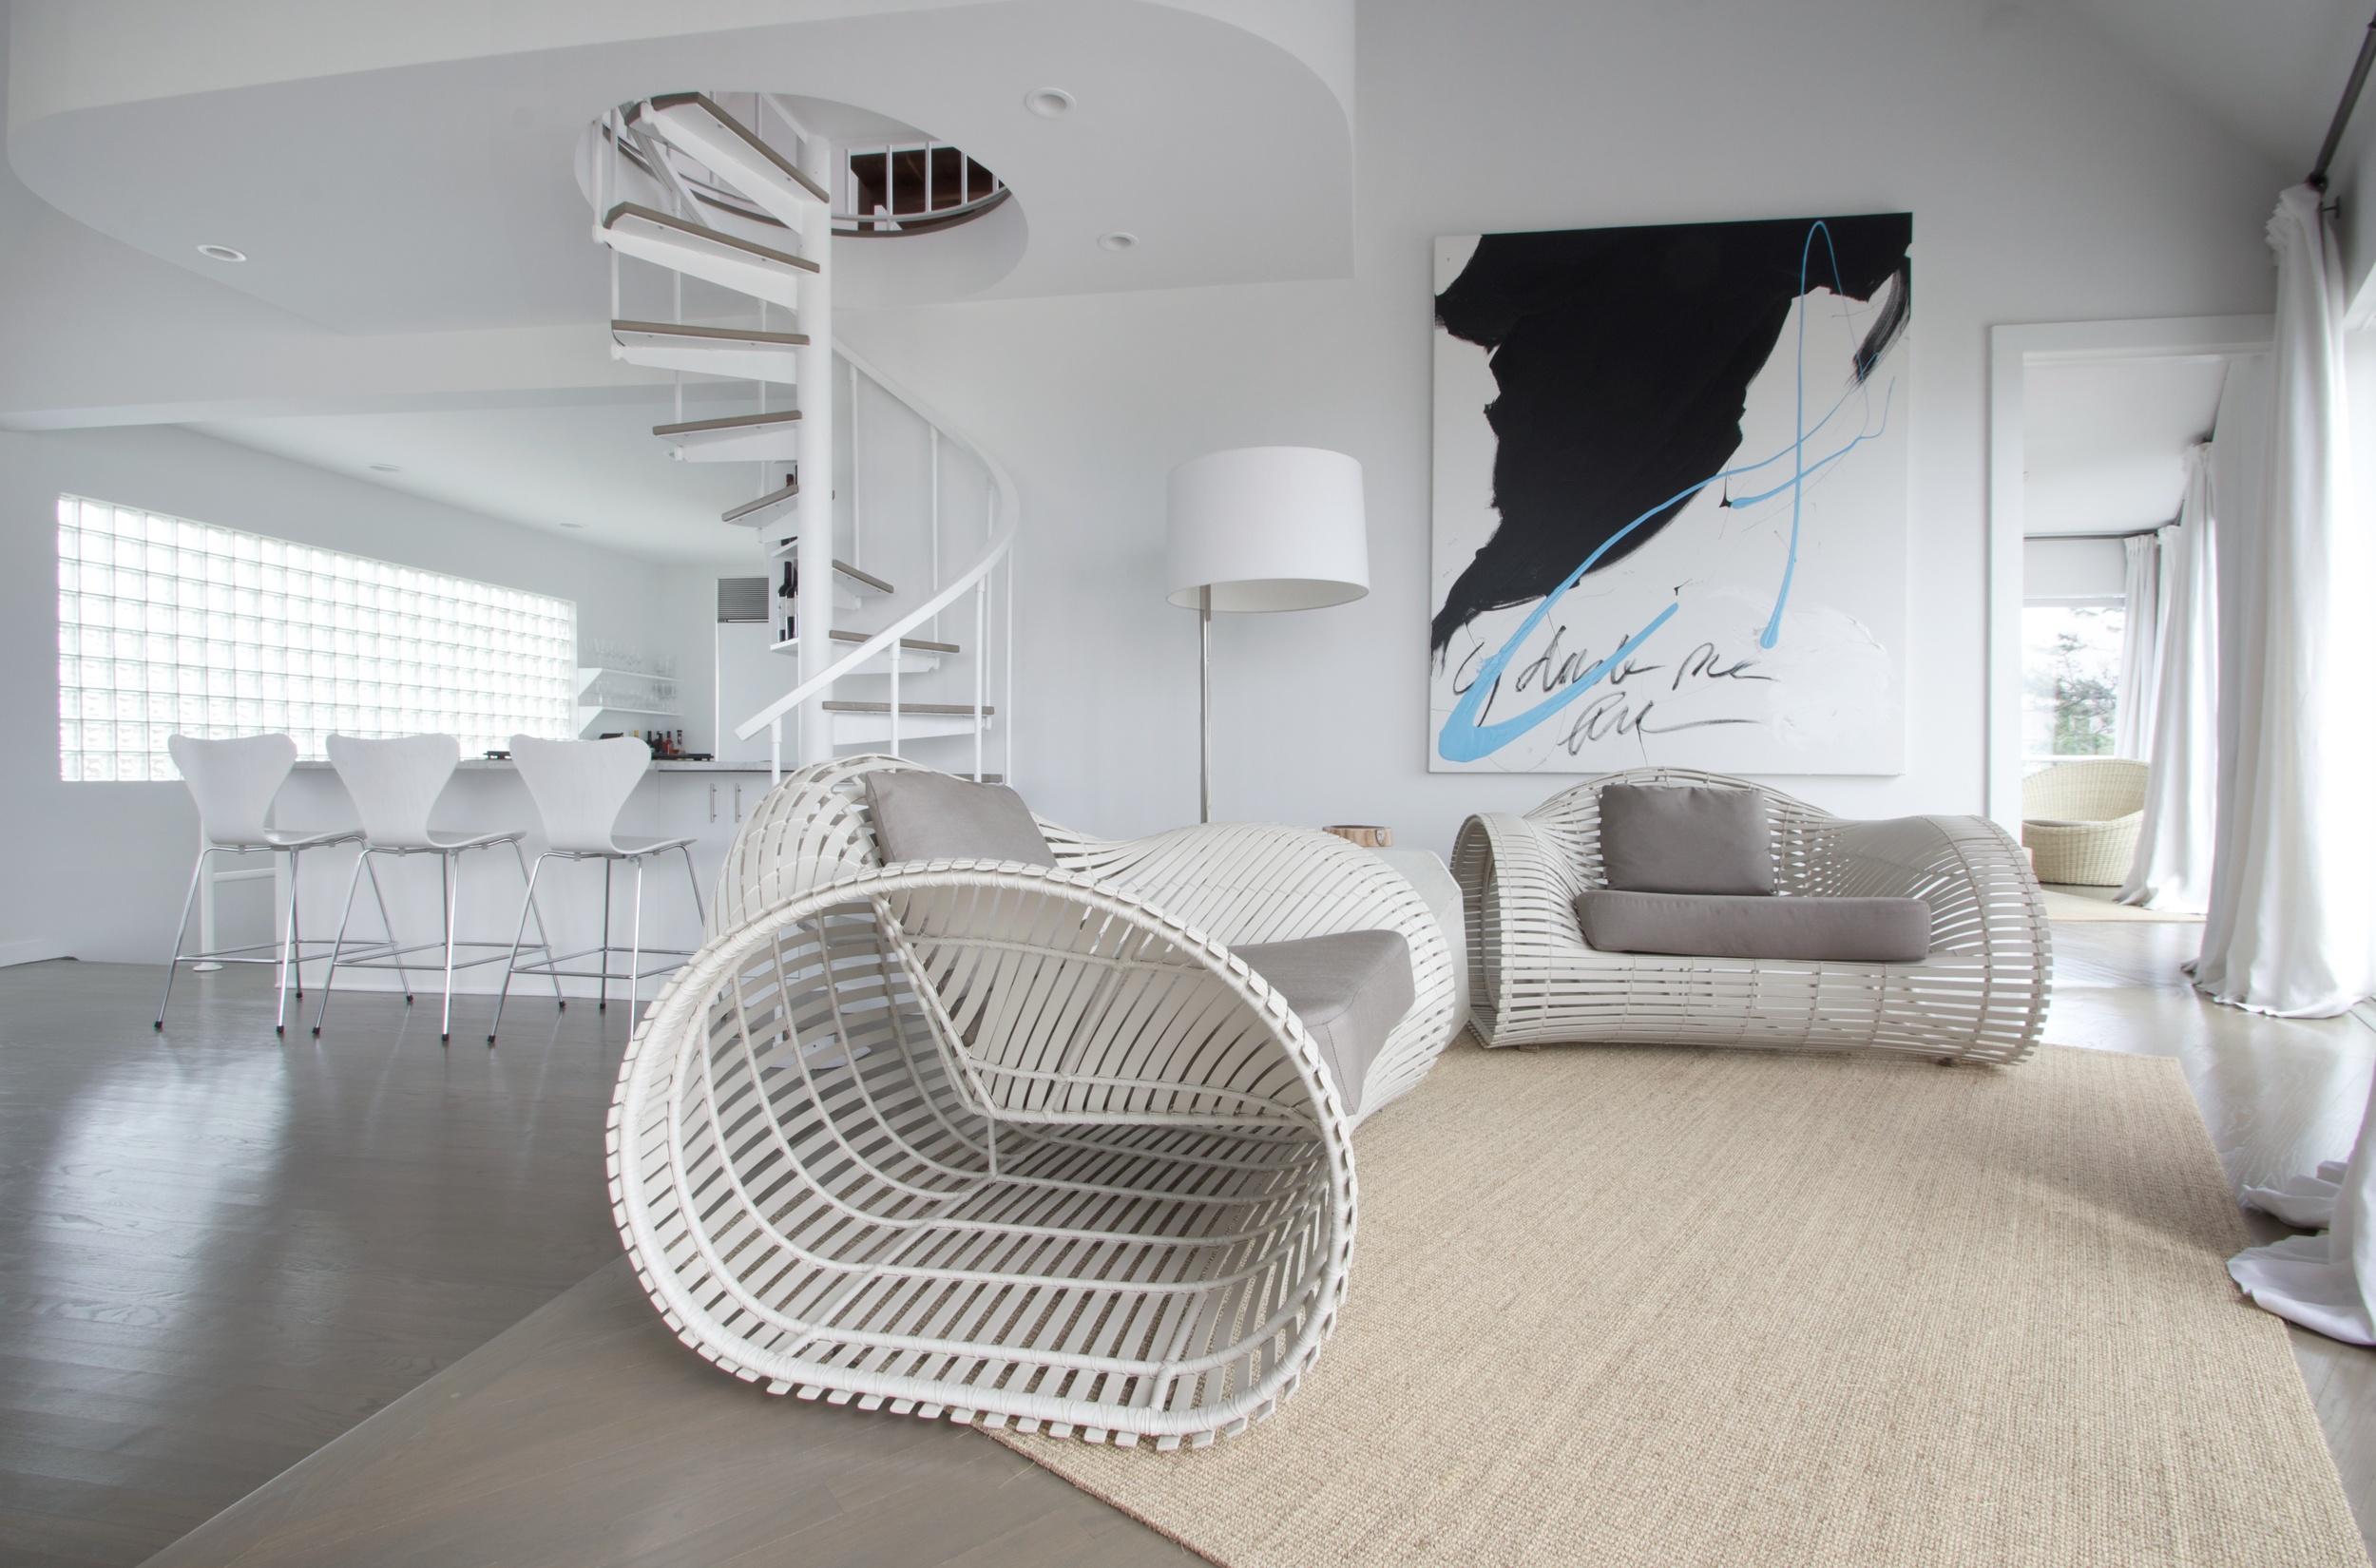 Schoeller + Darling Design - Amagansett Beach House -  Kitchen Lounge with Beach view